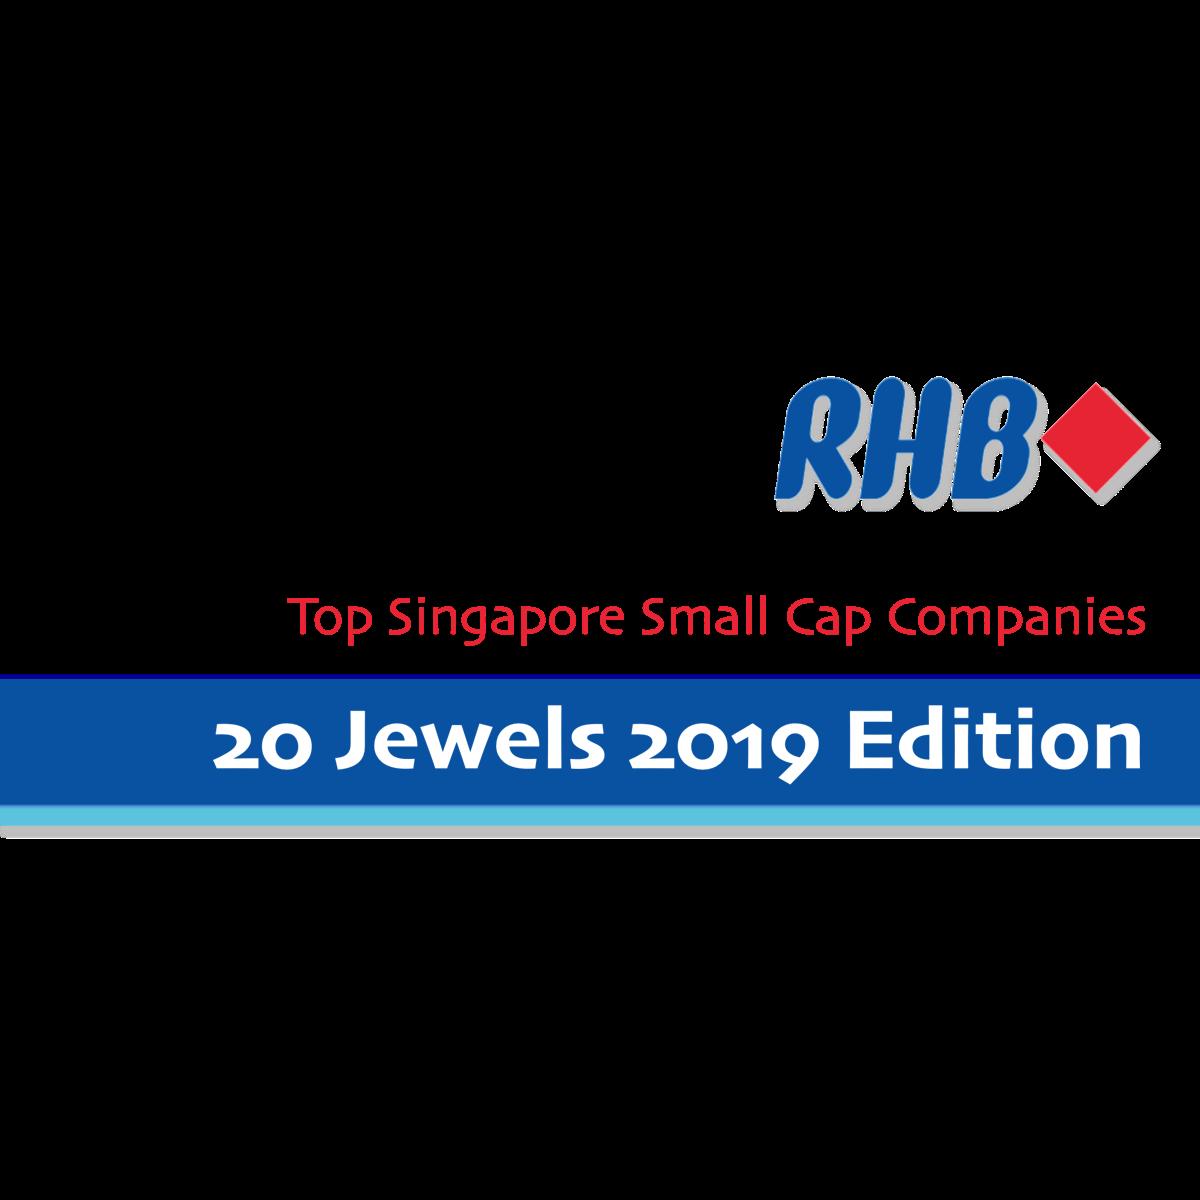 20 Jewels 2019 Edition - RHB Research | SGinvestors.io